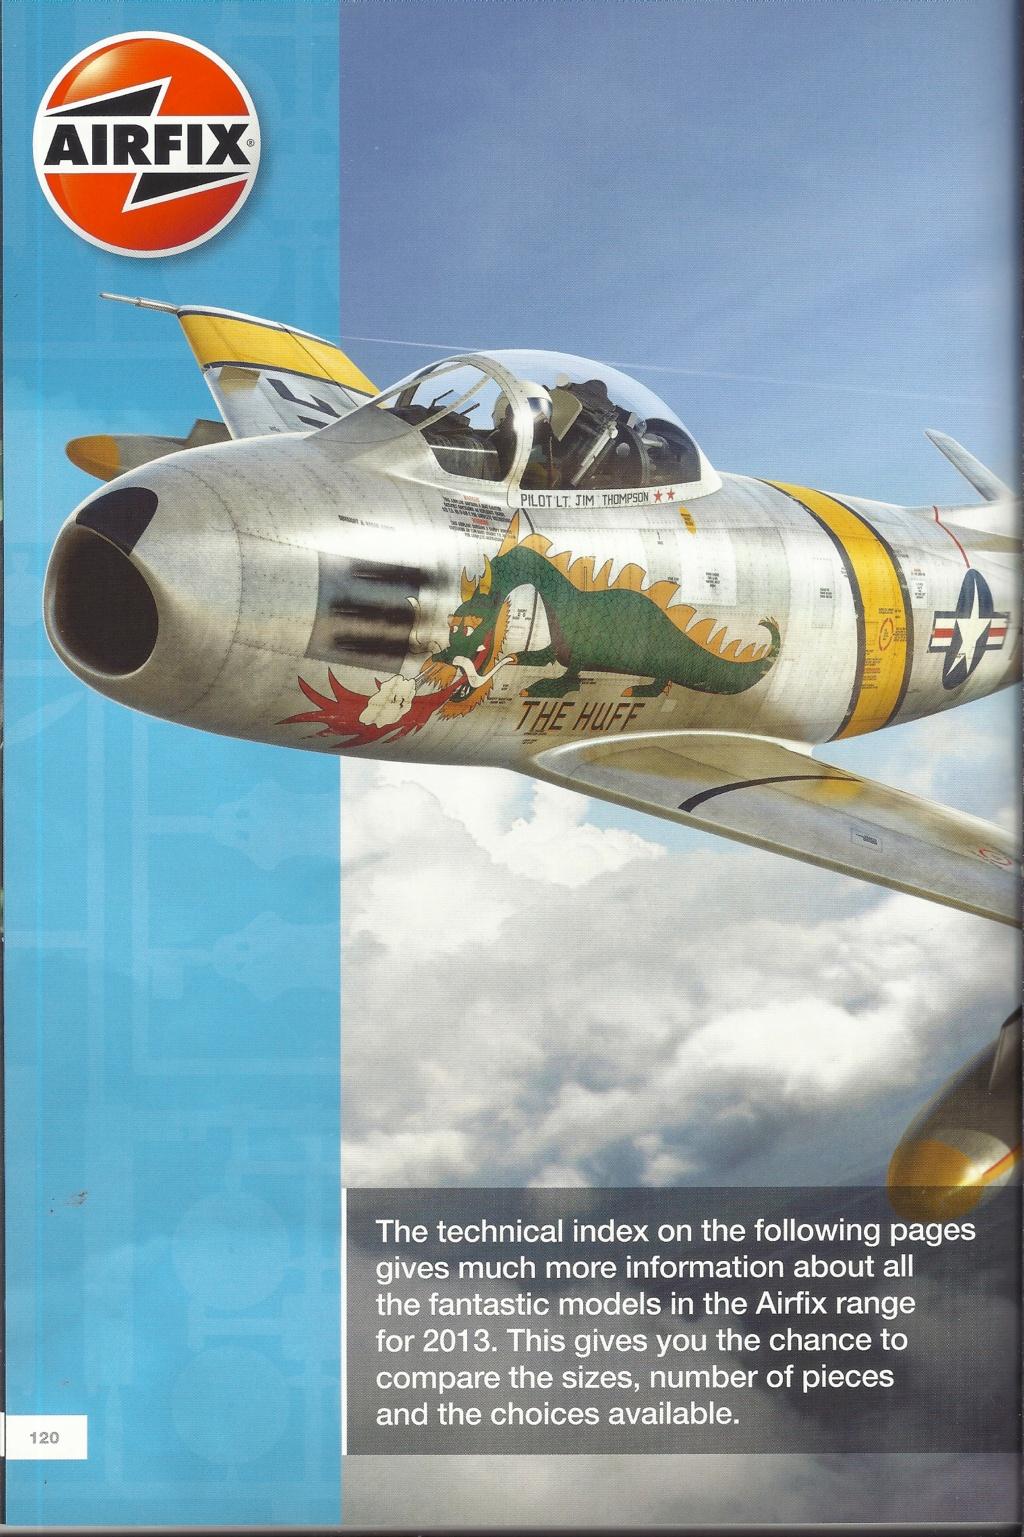 [AIRFIX 2013] Catalogue 2013 Airf1805